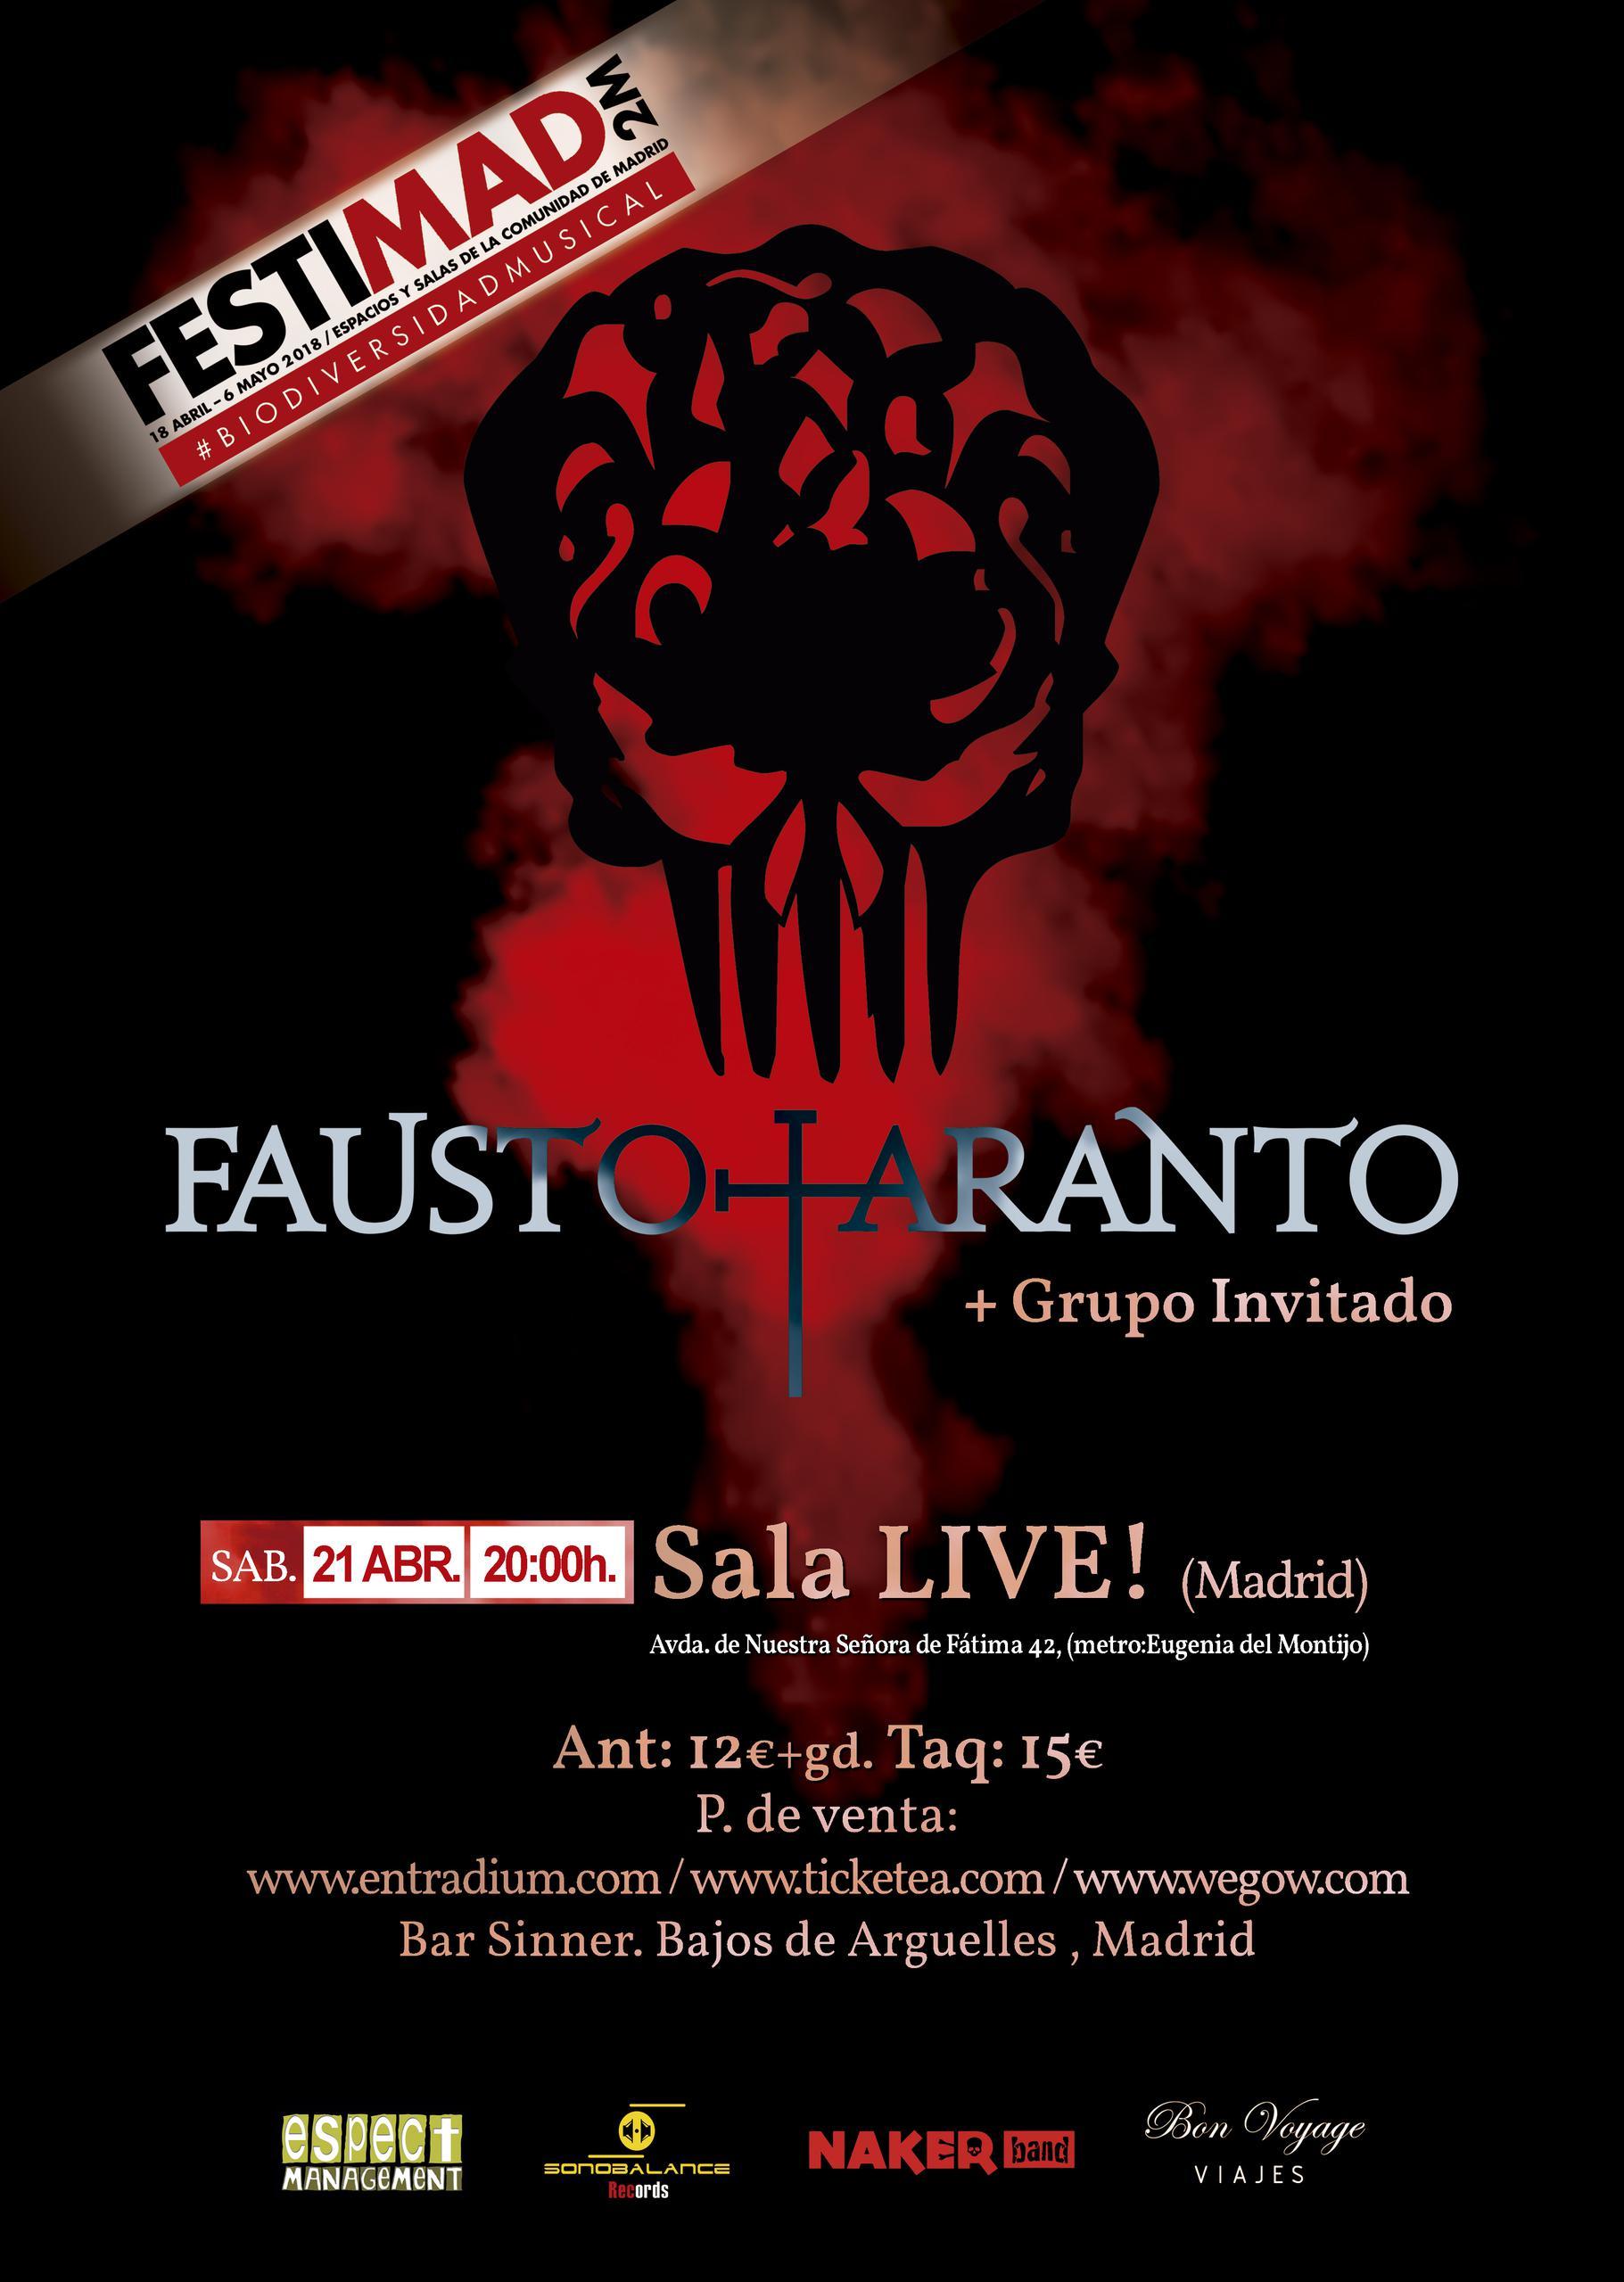 Fausto Taranto